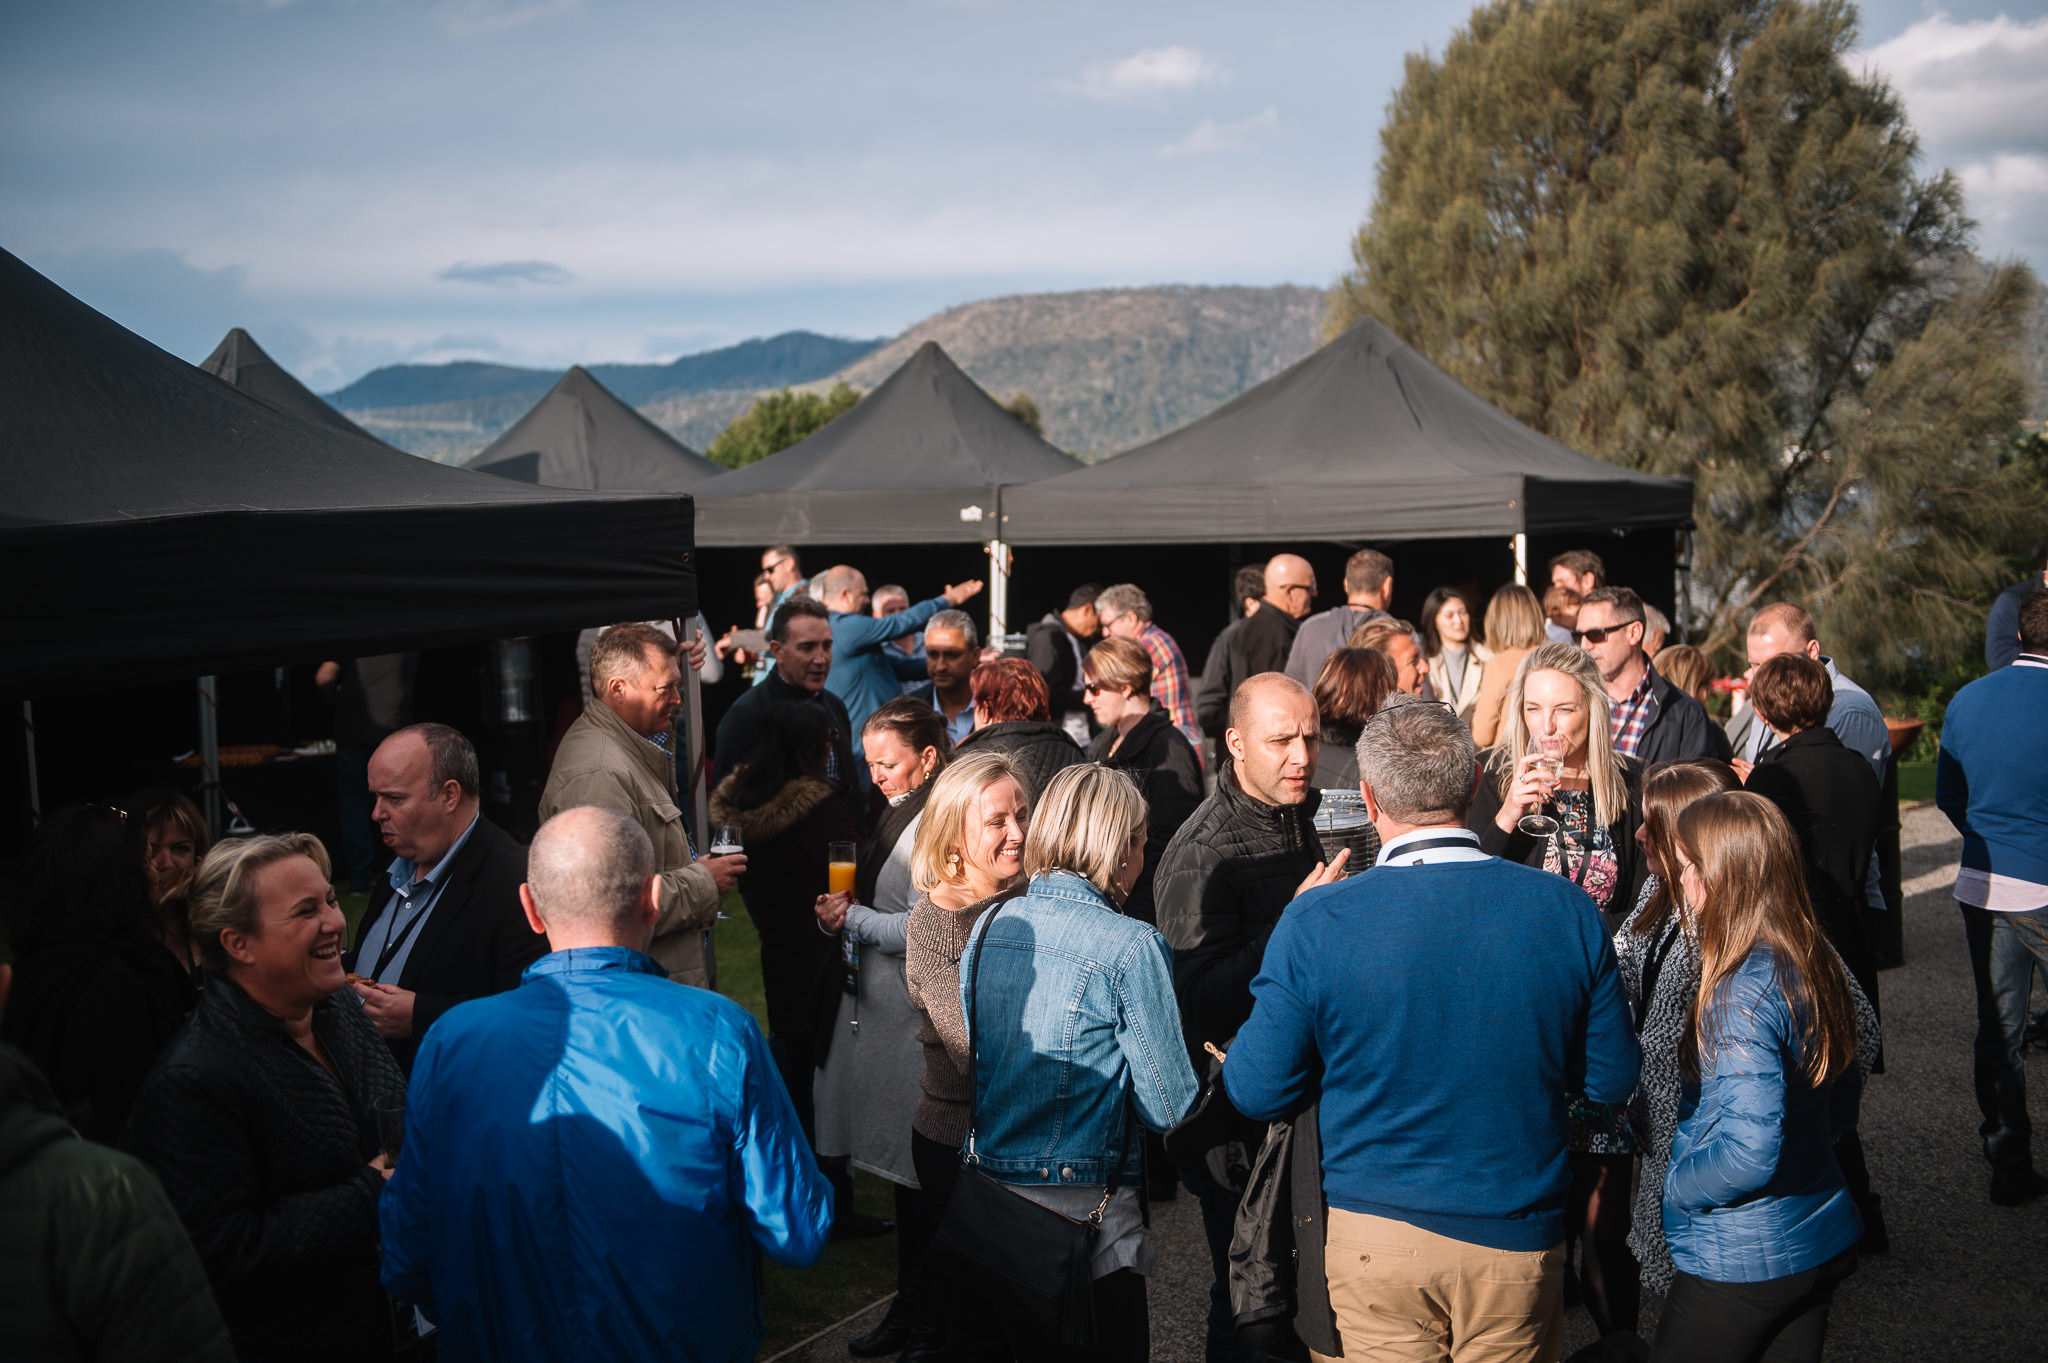 Tasmanian_Event_Photographer_39.jpg